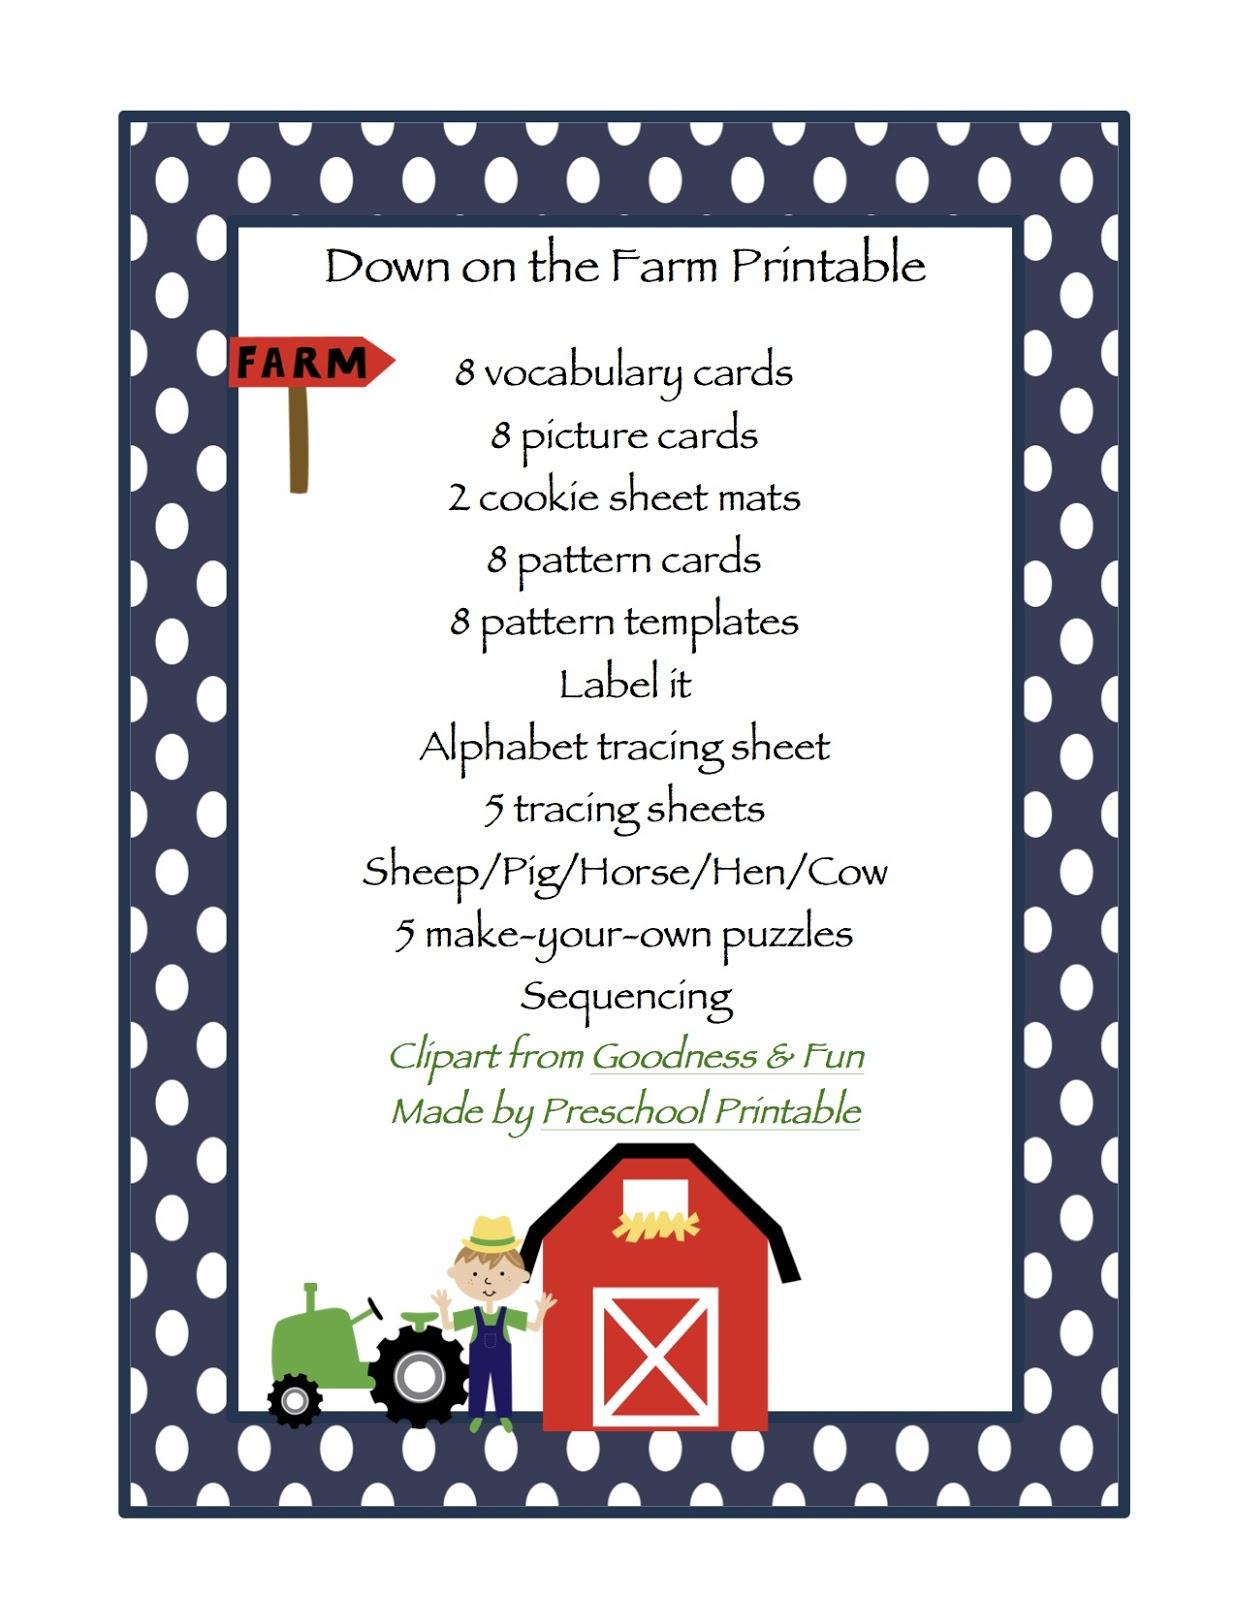 Down On The Farm Printable Preschool Printables